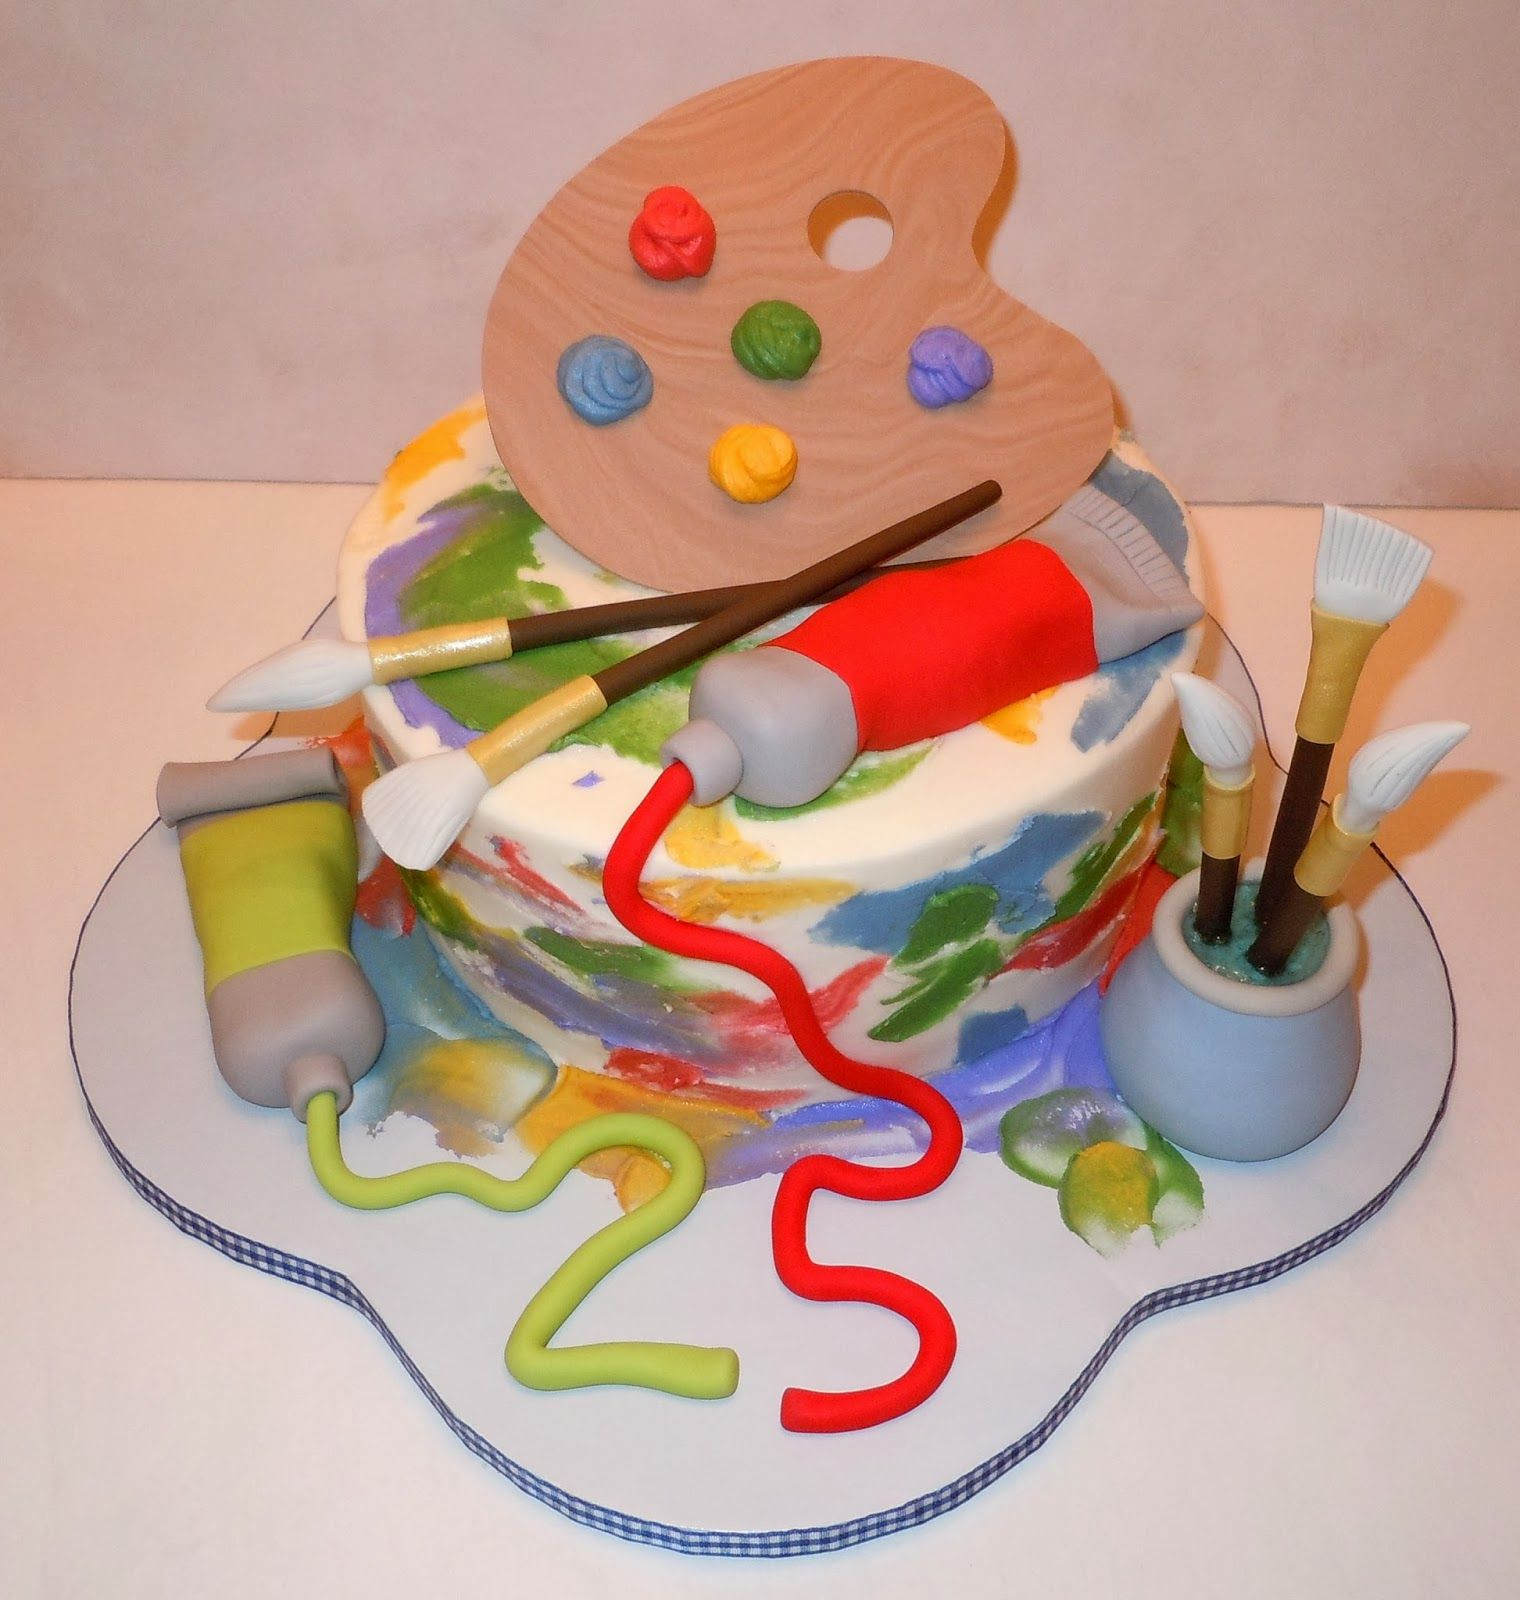 Cake Artist Painter : painting+cake.jpg (1520x1600) Hella Pinterest Cake ...